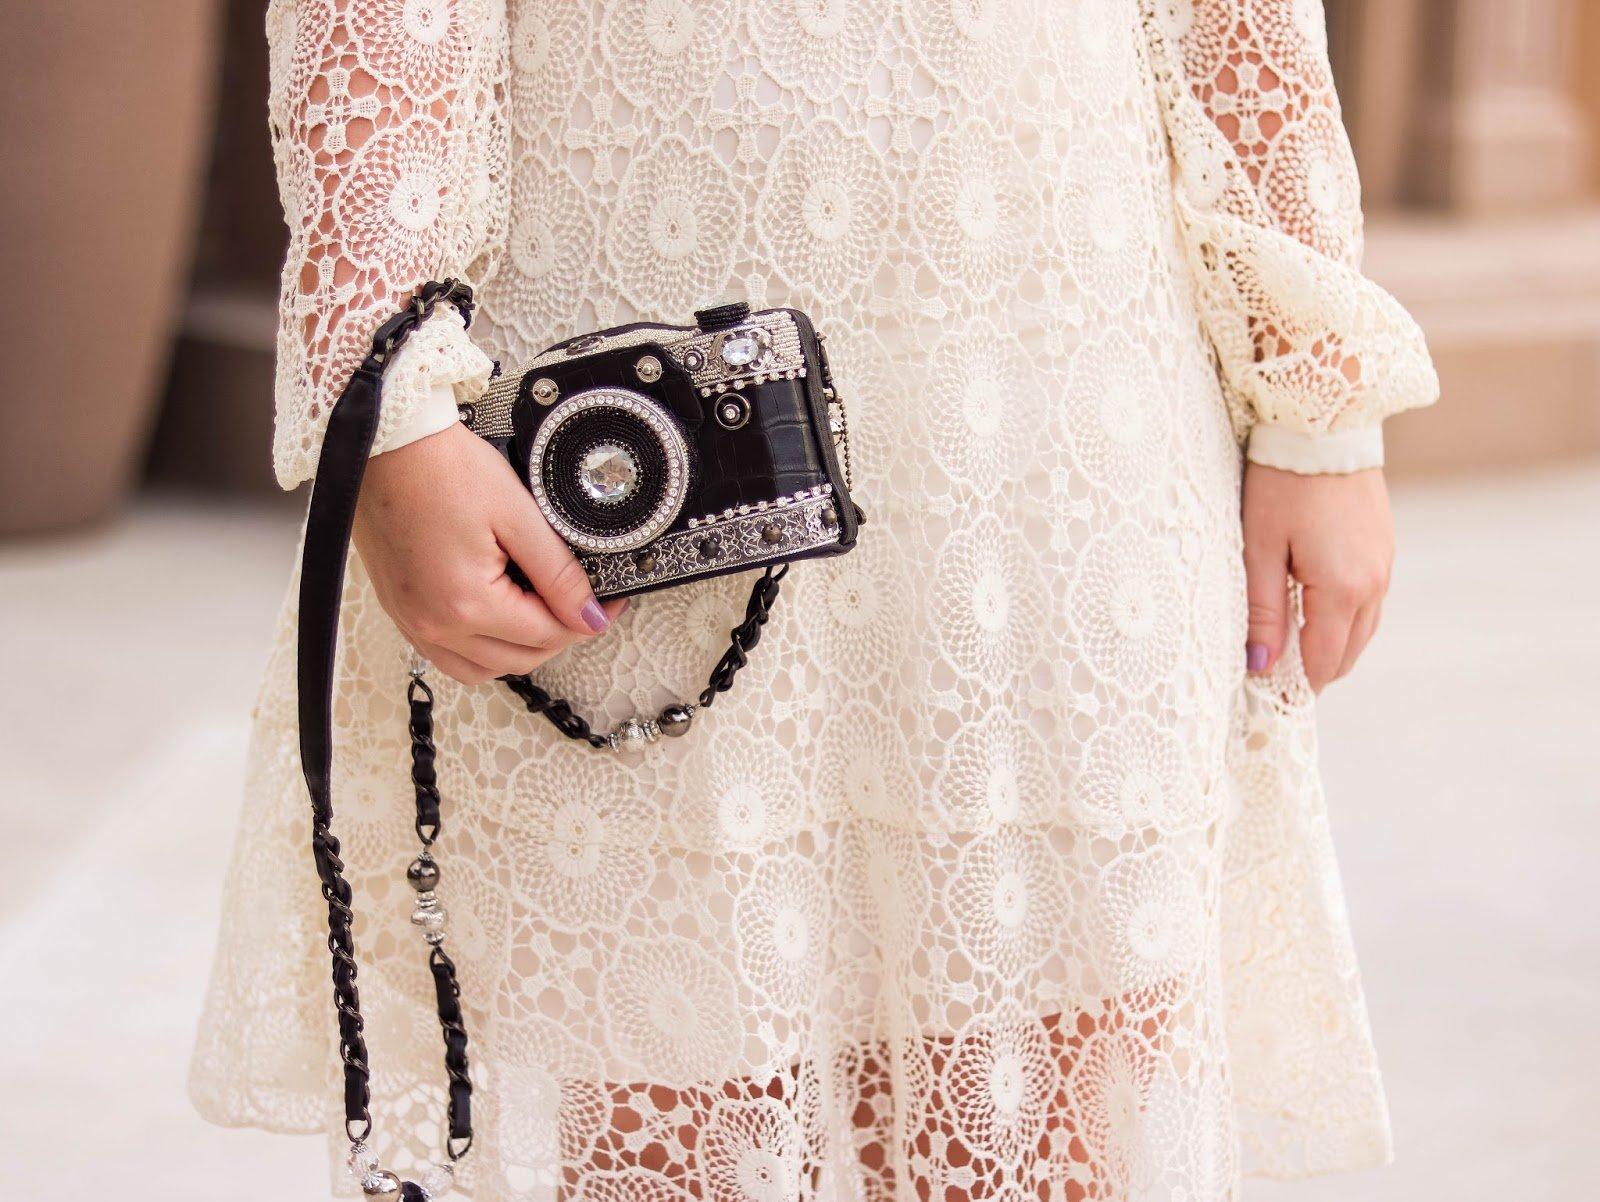 Fashion Blogger Elizabeth Hugen of Lizzie in Lace shares her Mary Frances designer handbag collection including this gorgeous black camera handbag